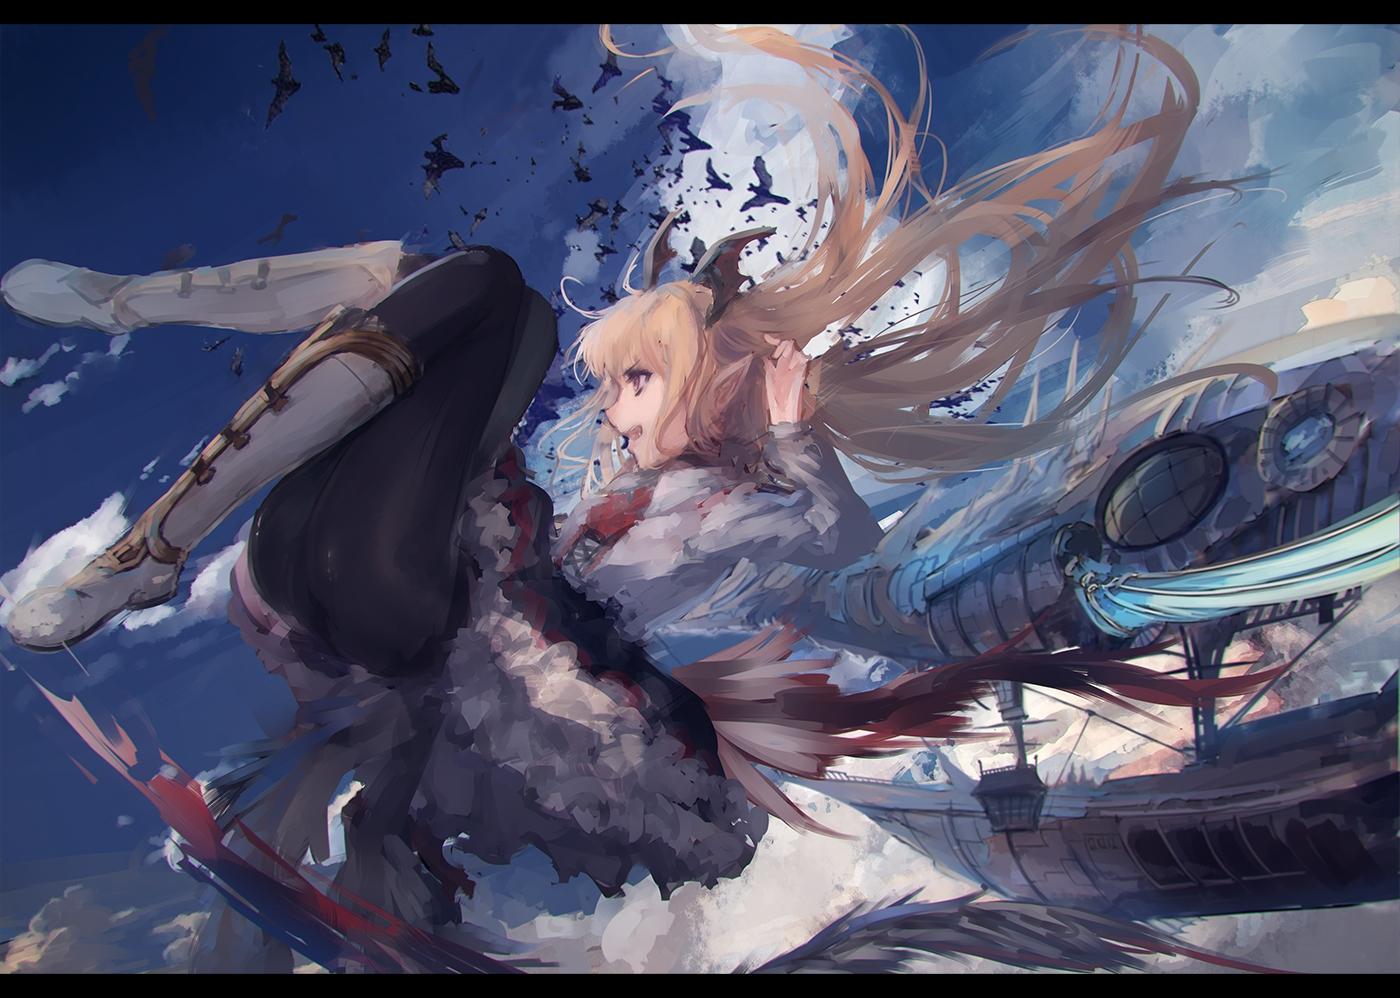 aircraft animal bat blonde_hair boots granblue_fantasy long_hair pantyhose pointed_ears rean_(r_ean) vampire vampy wings